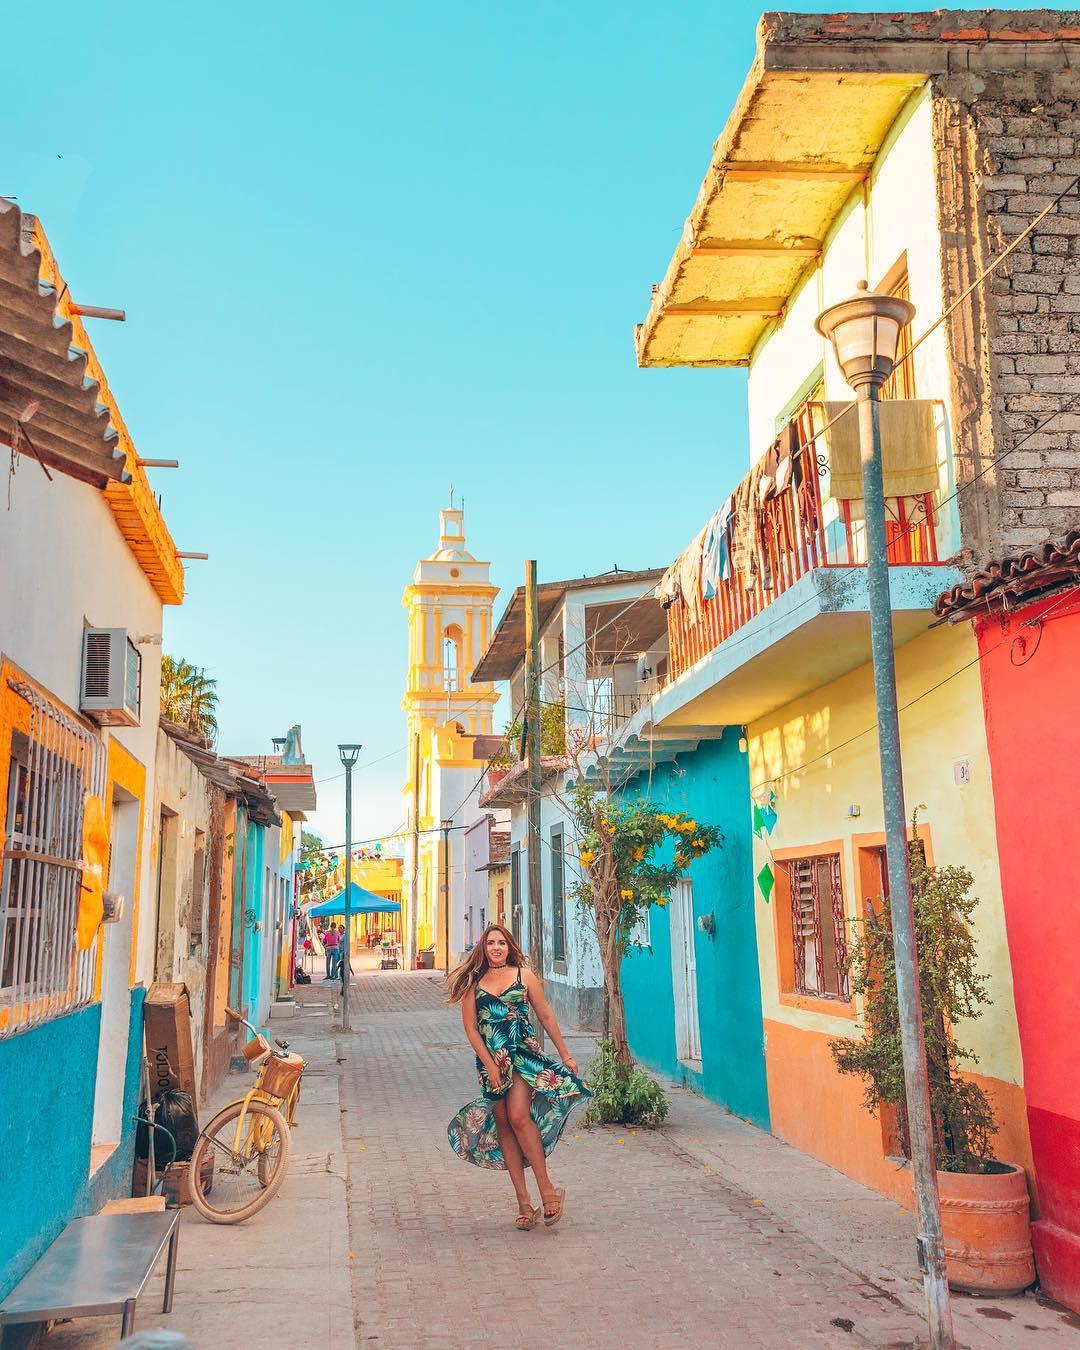 Mexcaltitán lugar instagrameable